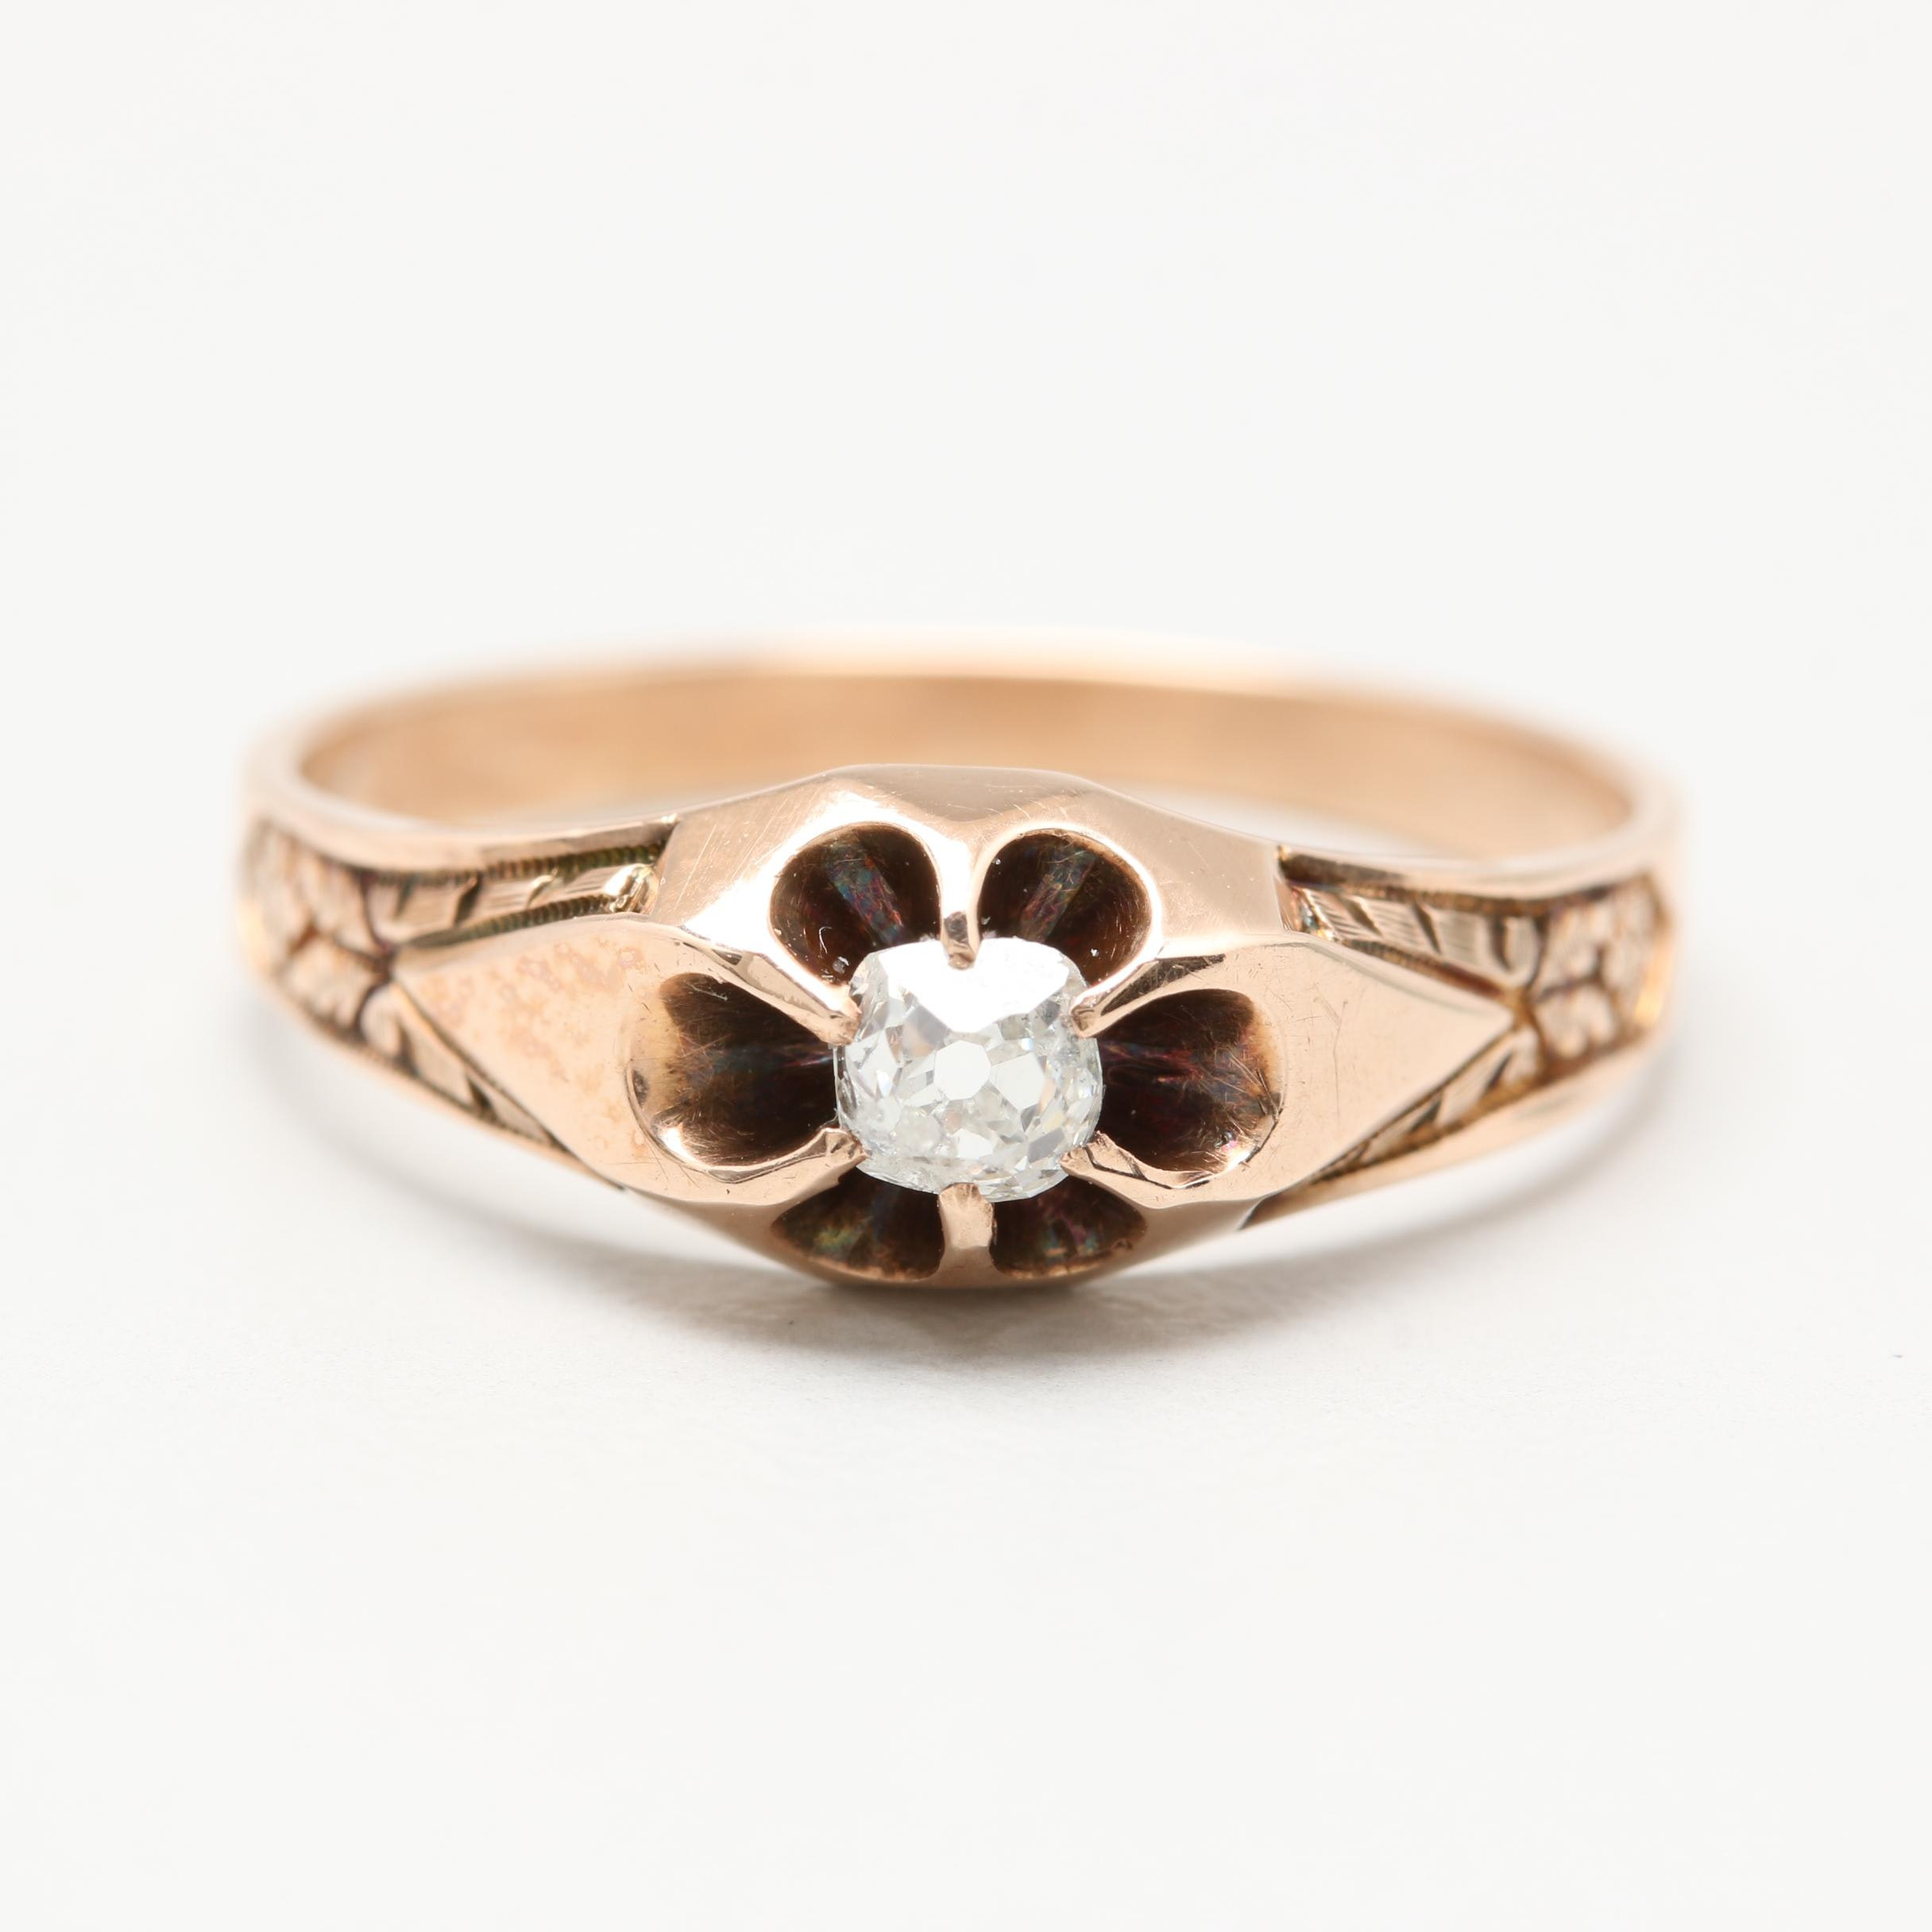 Victorian 10K Yellow Gold Diamond Belcher Ring